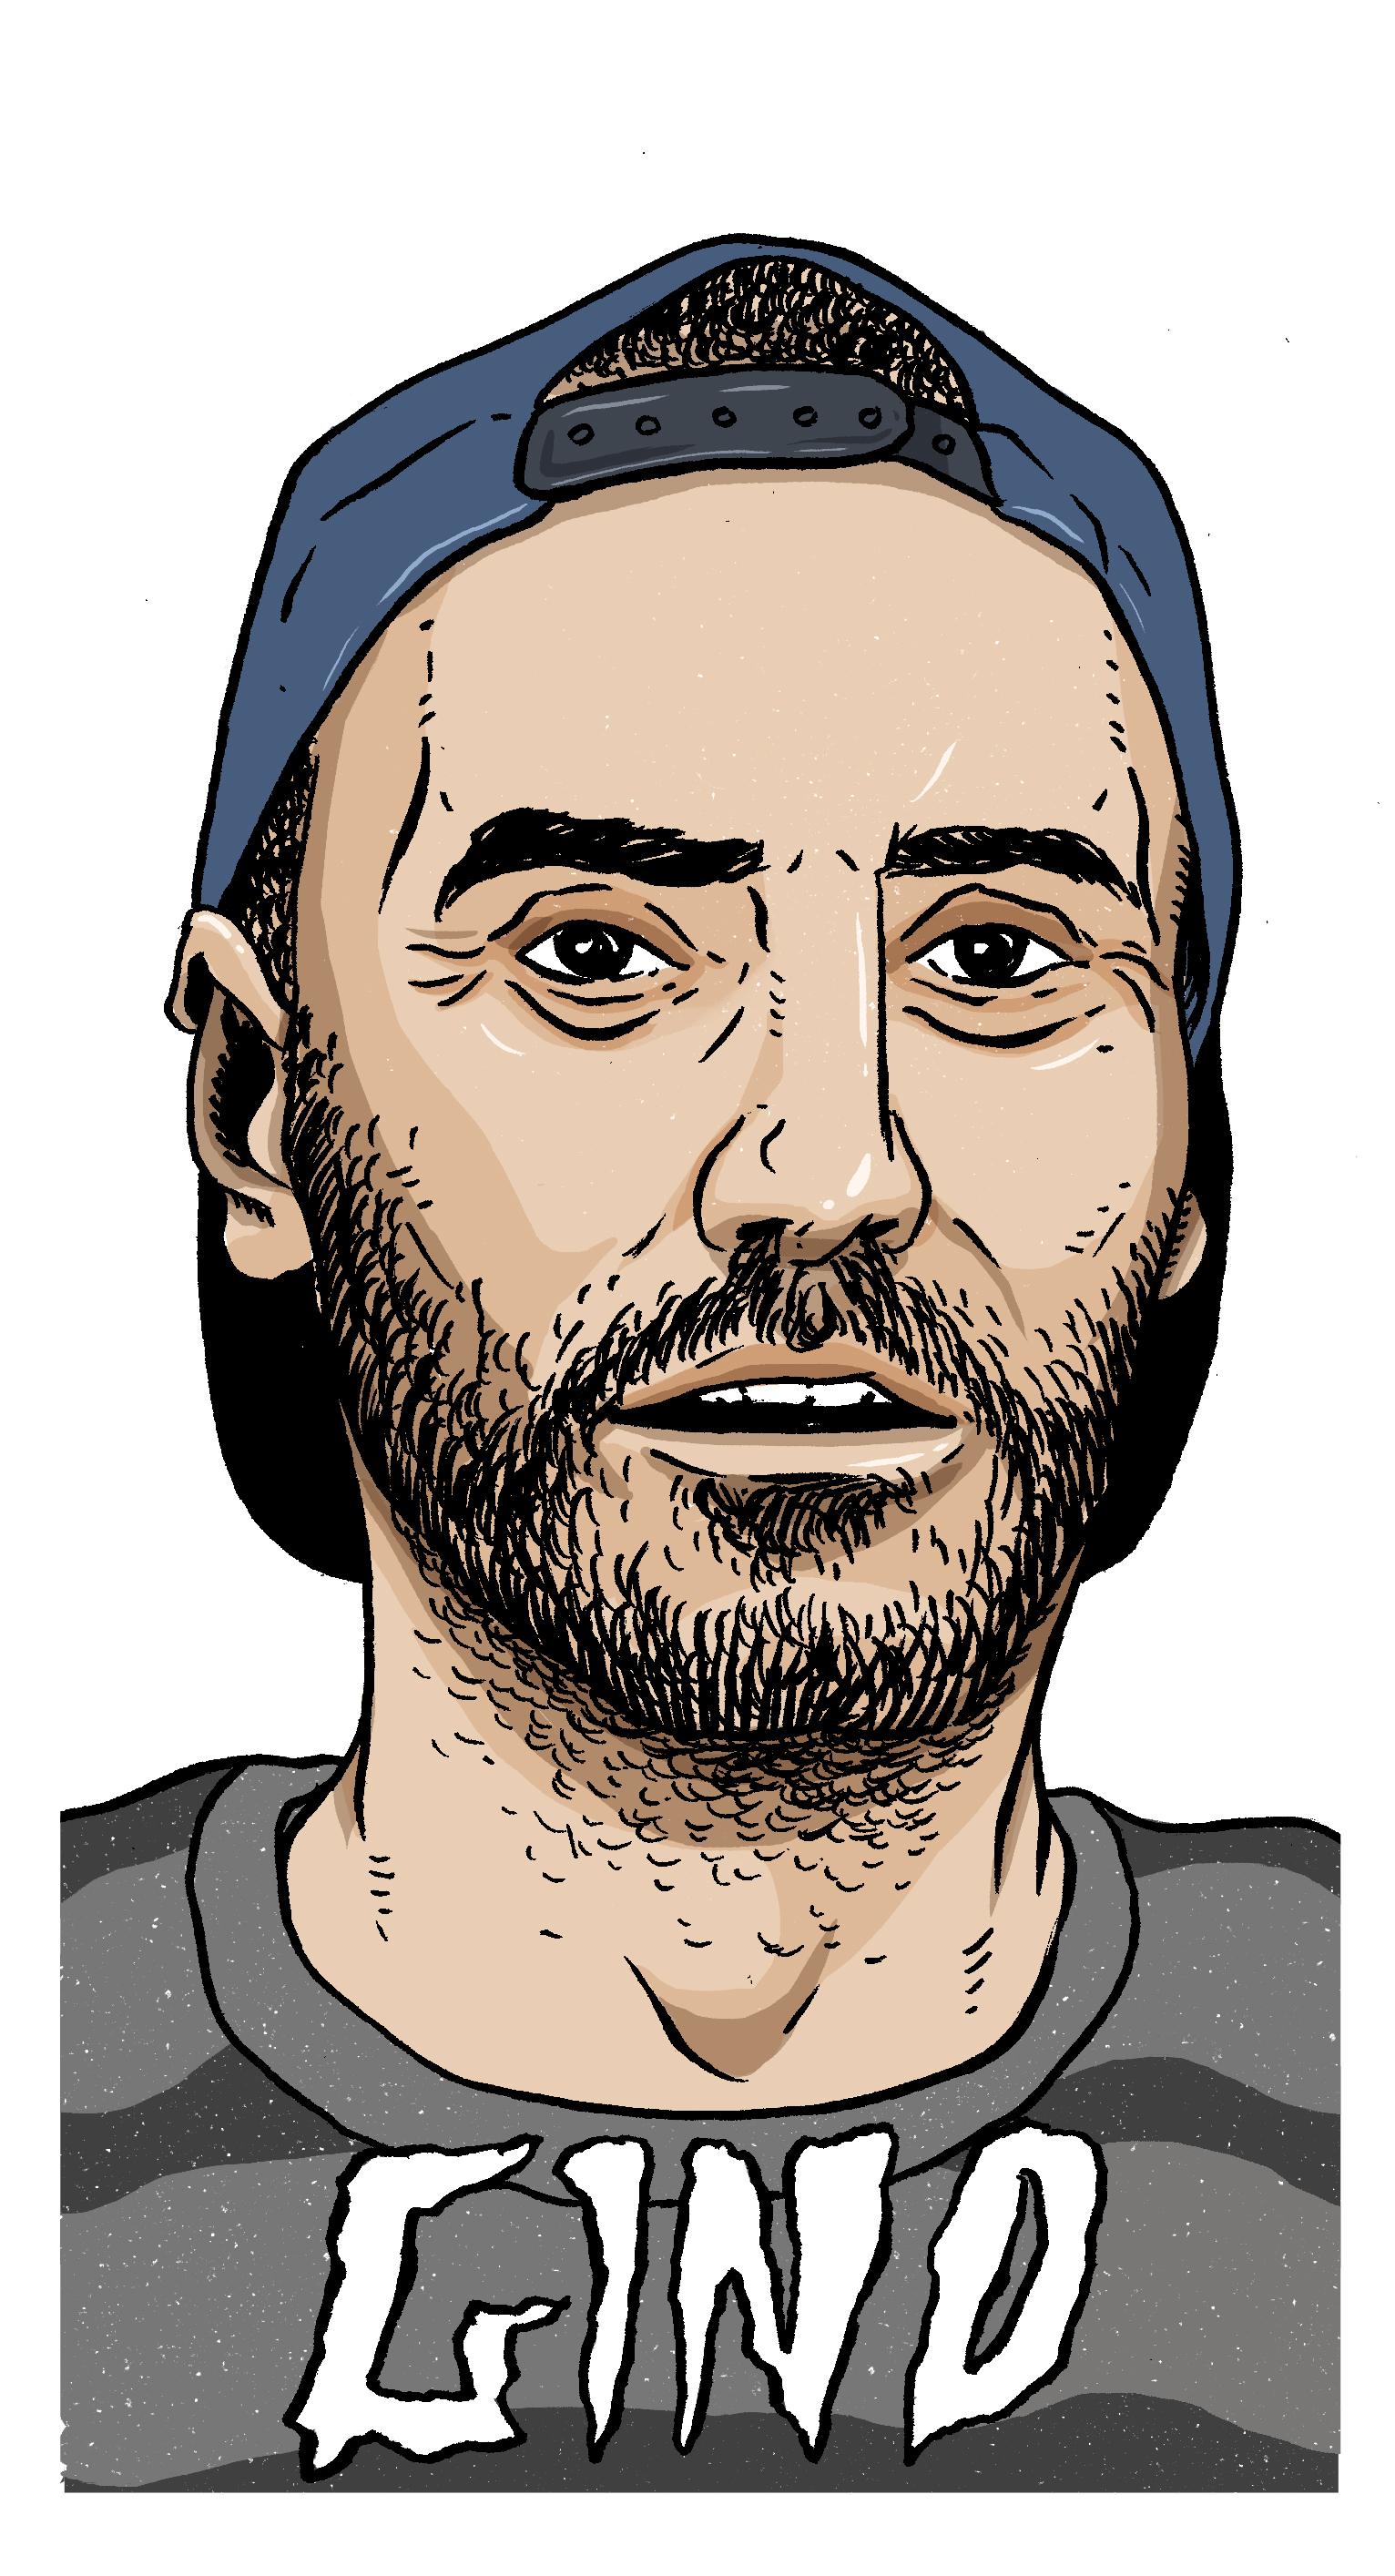 gino_iannucci_fuckingawesome_crossfire_george_yarnton_illustration